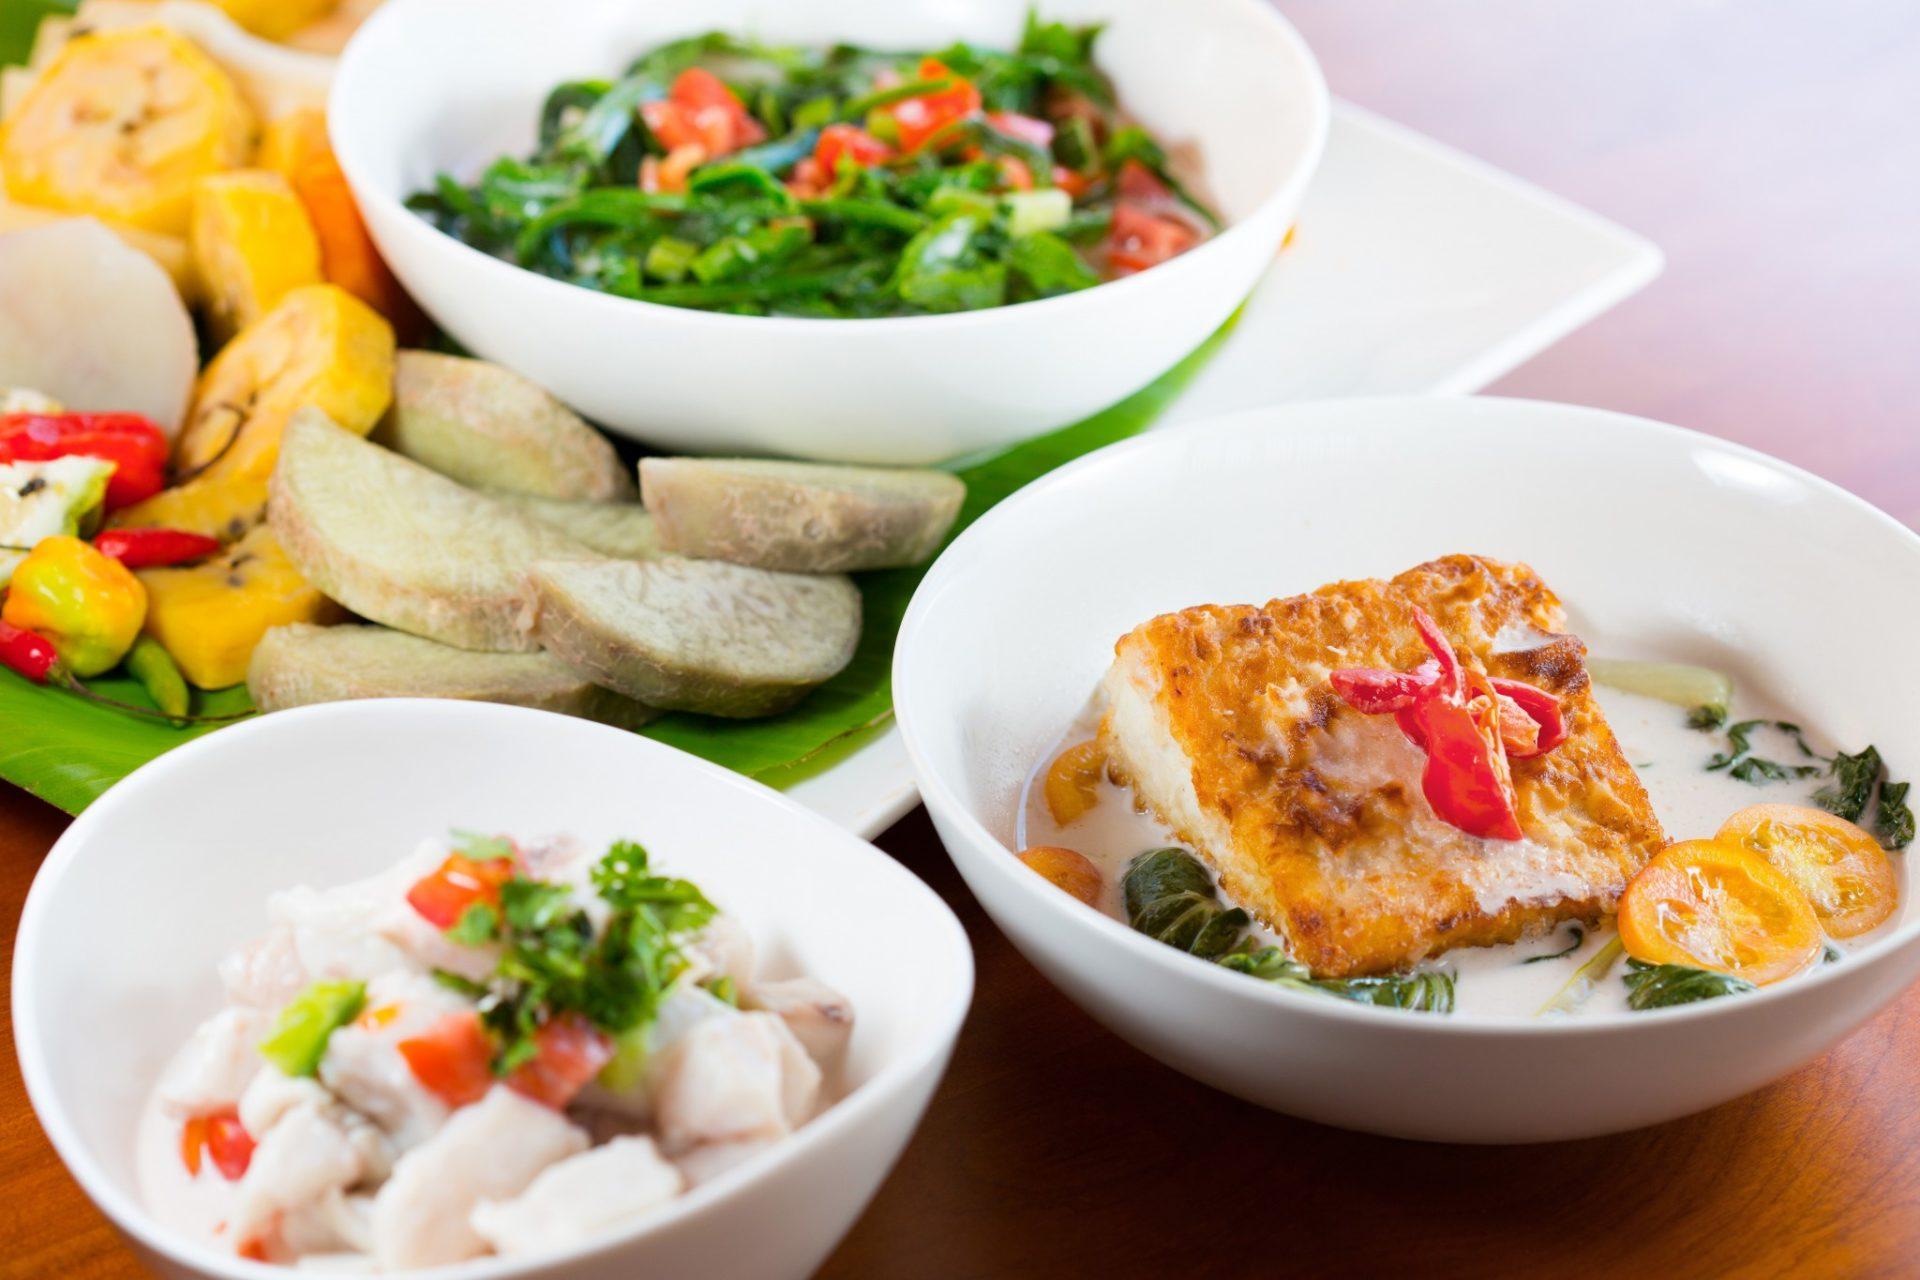 Fijian cooking school offers flavorful lessons kokoda for Cuisine usine